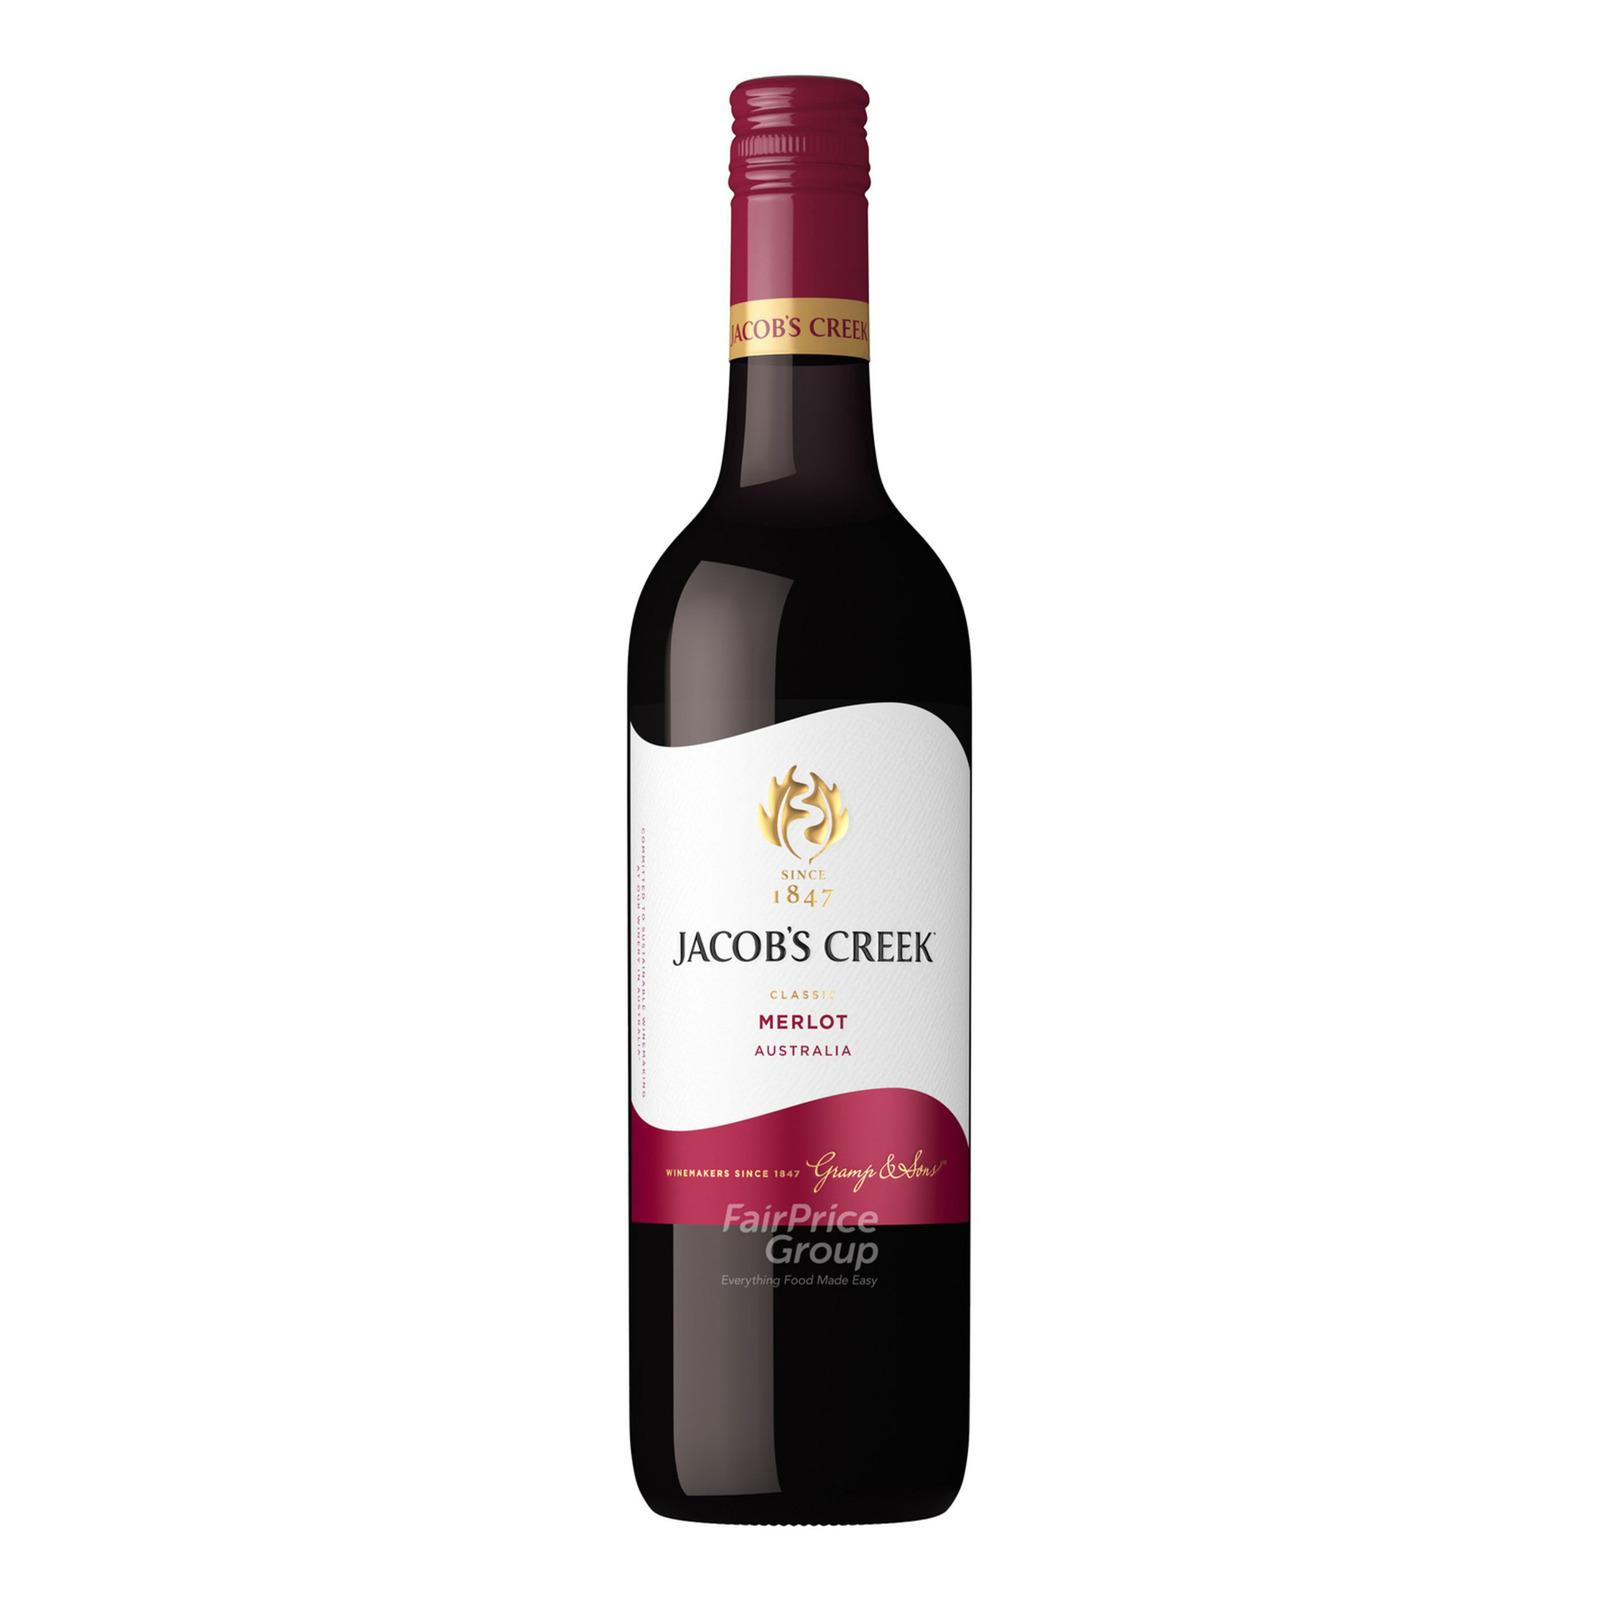 Jacob's Creek Classic Red Wine - Merlot